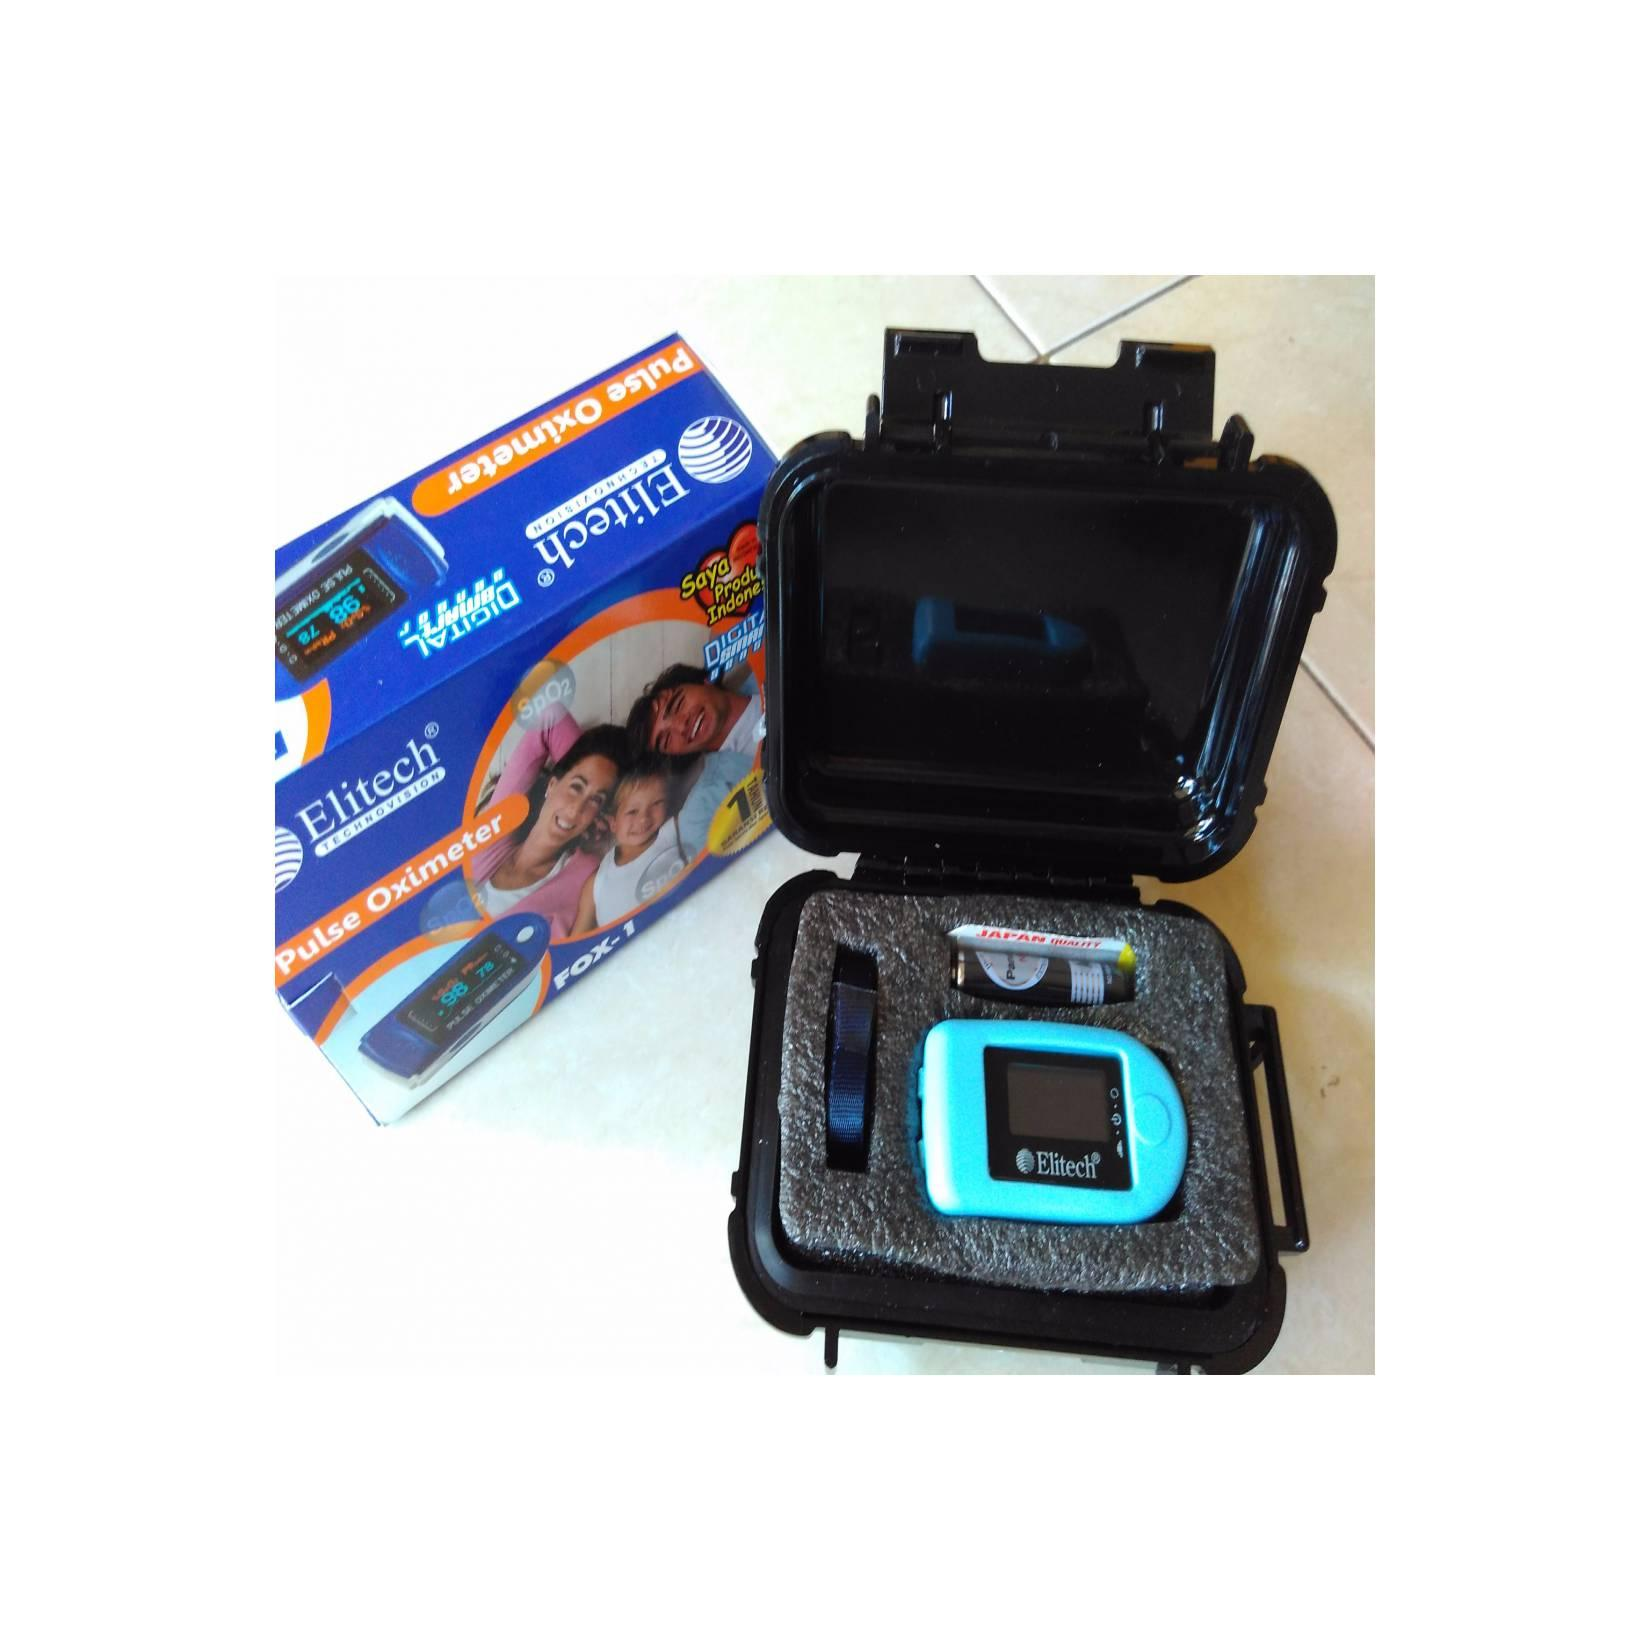 JUAL Digital Pulse Oximeter ELITECH